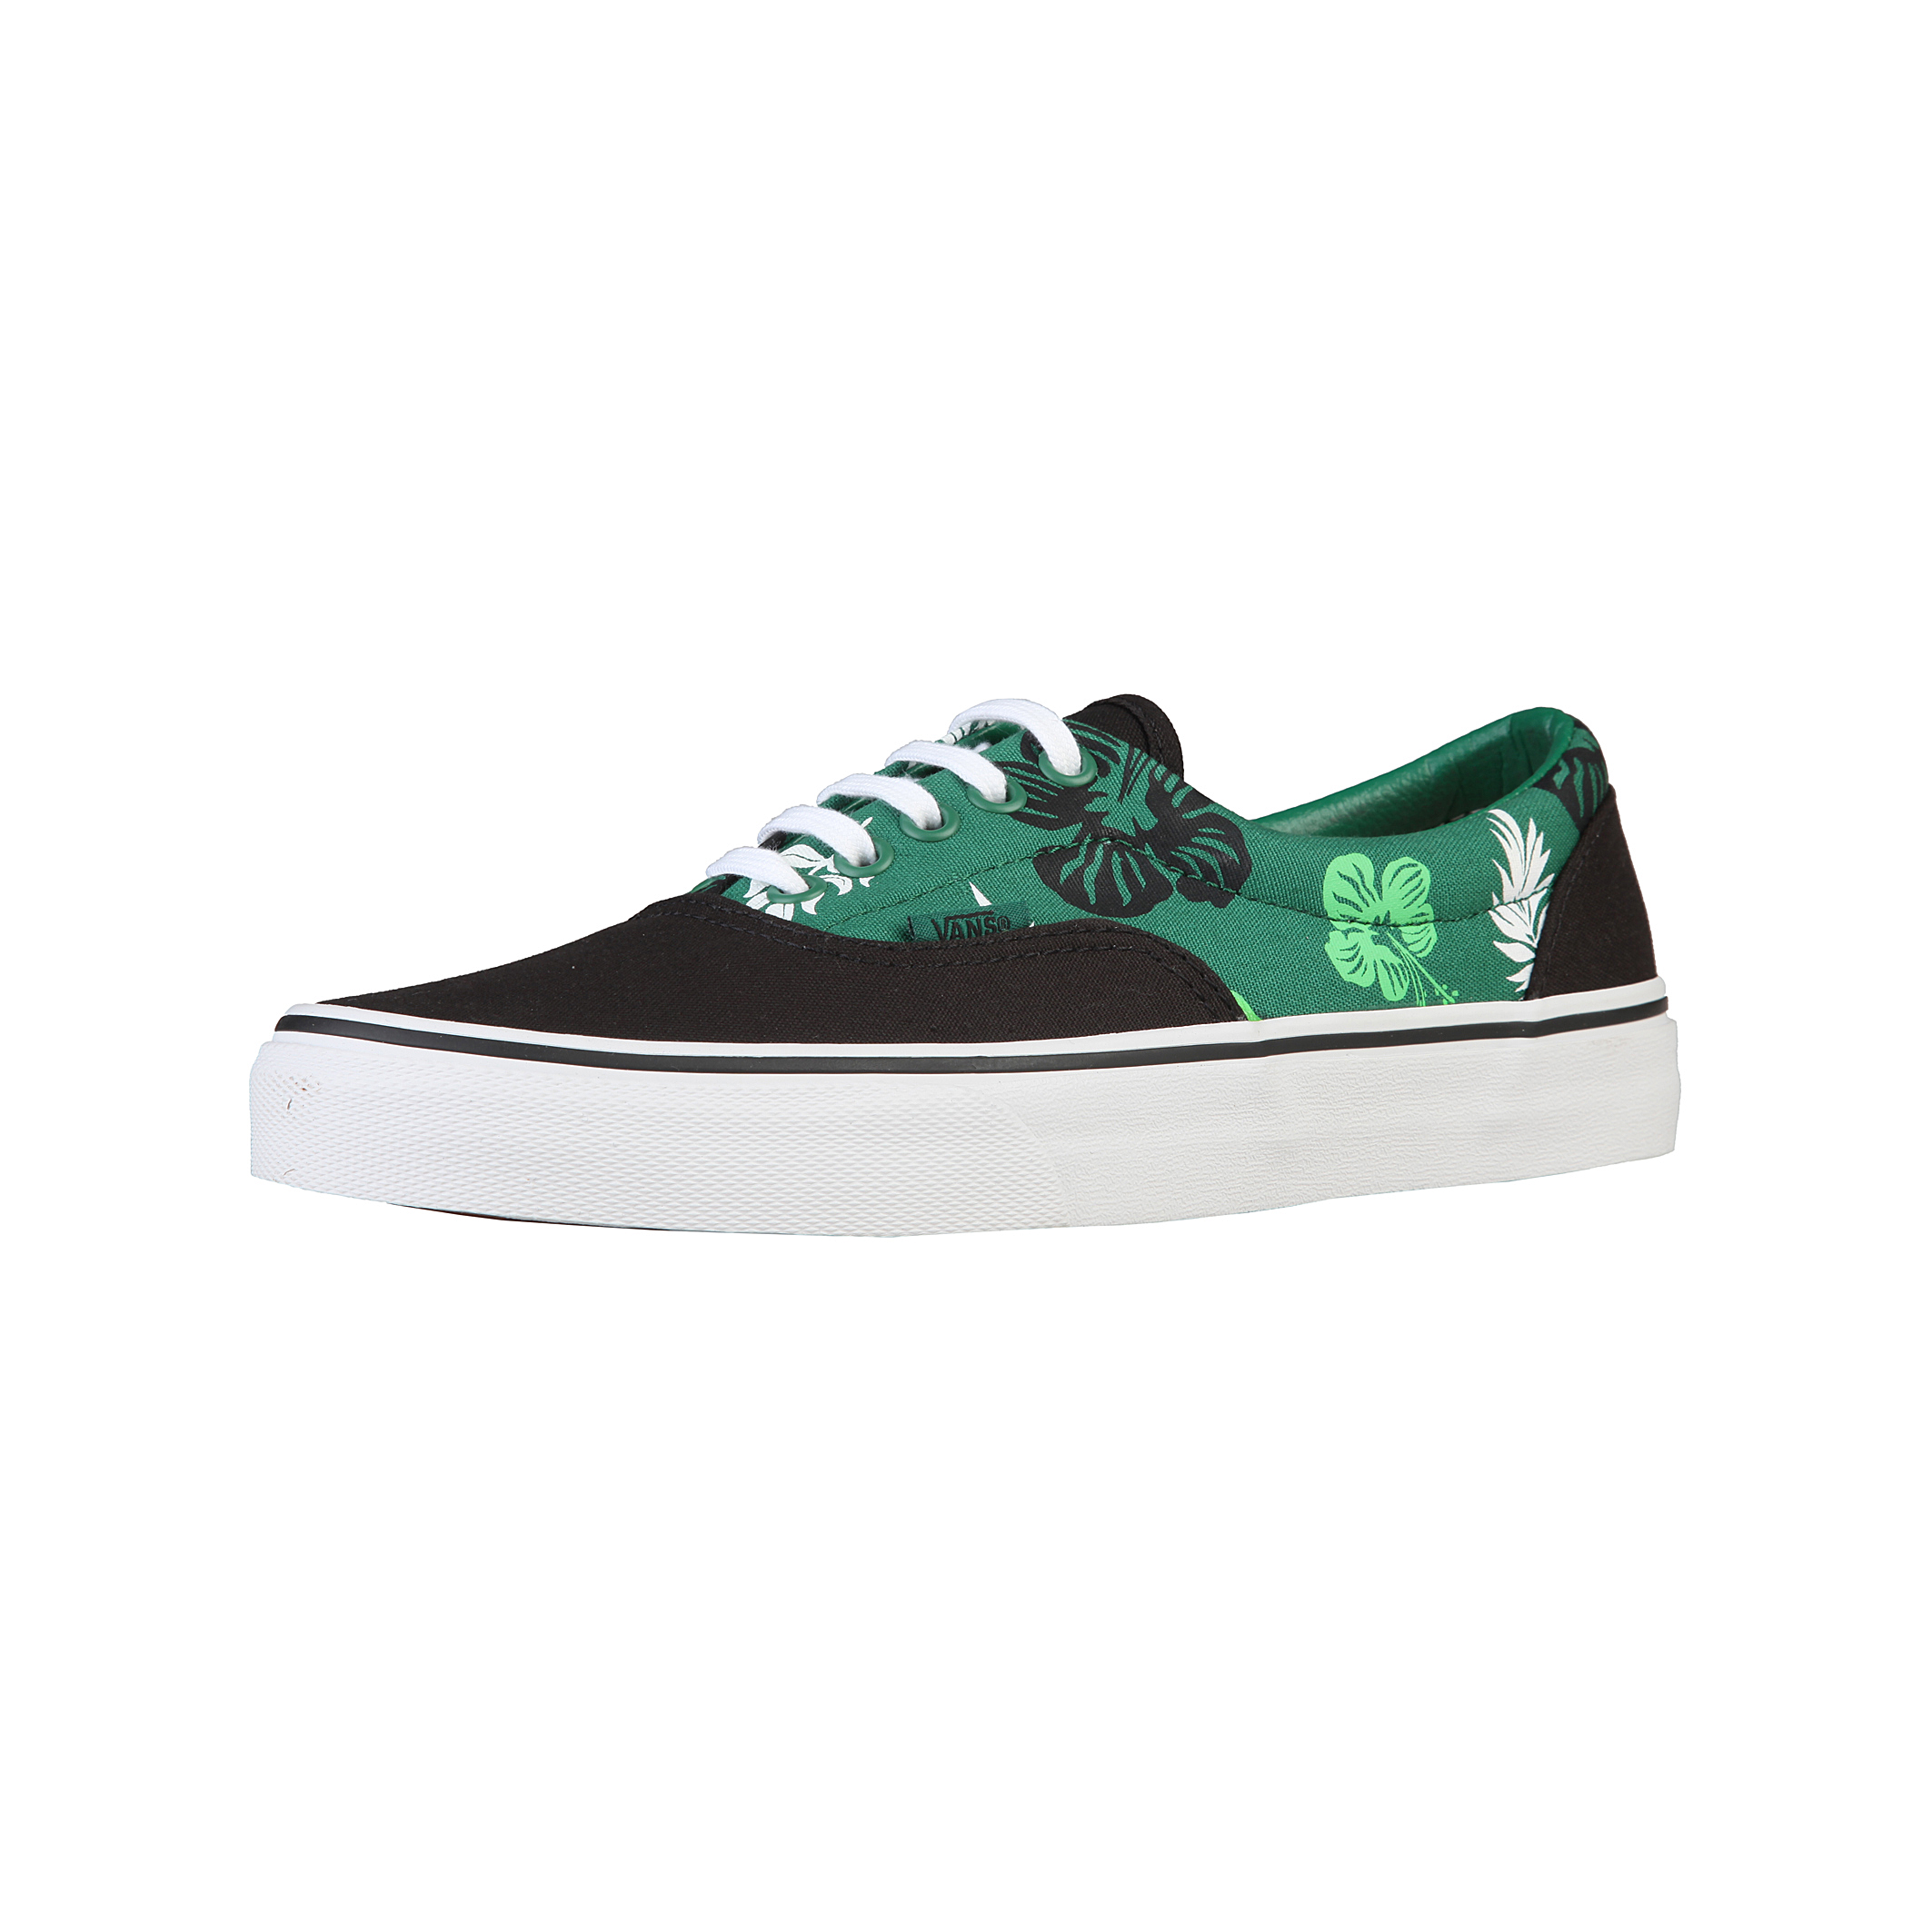 Vans ERA Unisex Damen Herren Schuhe Low-Top Sneaker Schnürschuhe ... 63a62321f4